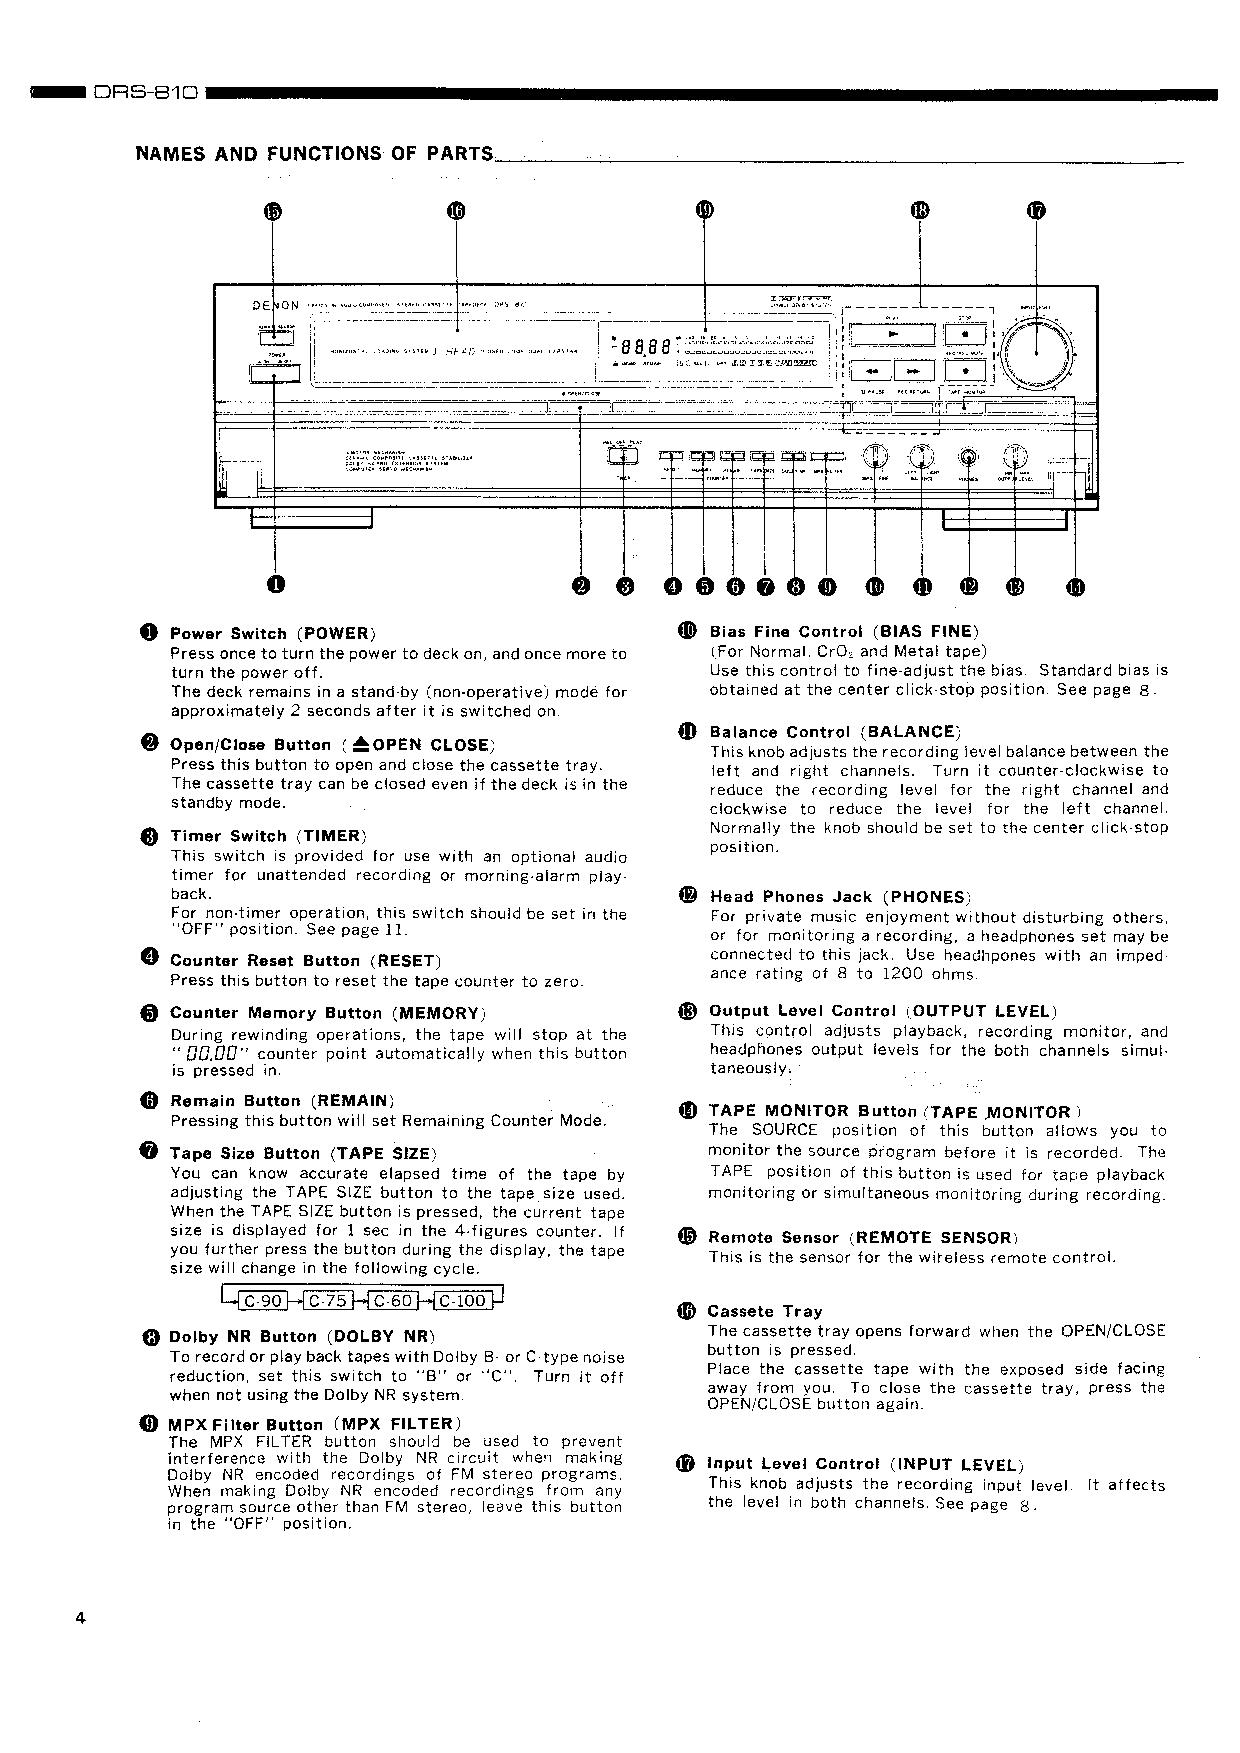 Denon DRS-810 Service Manual